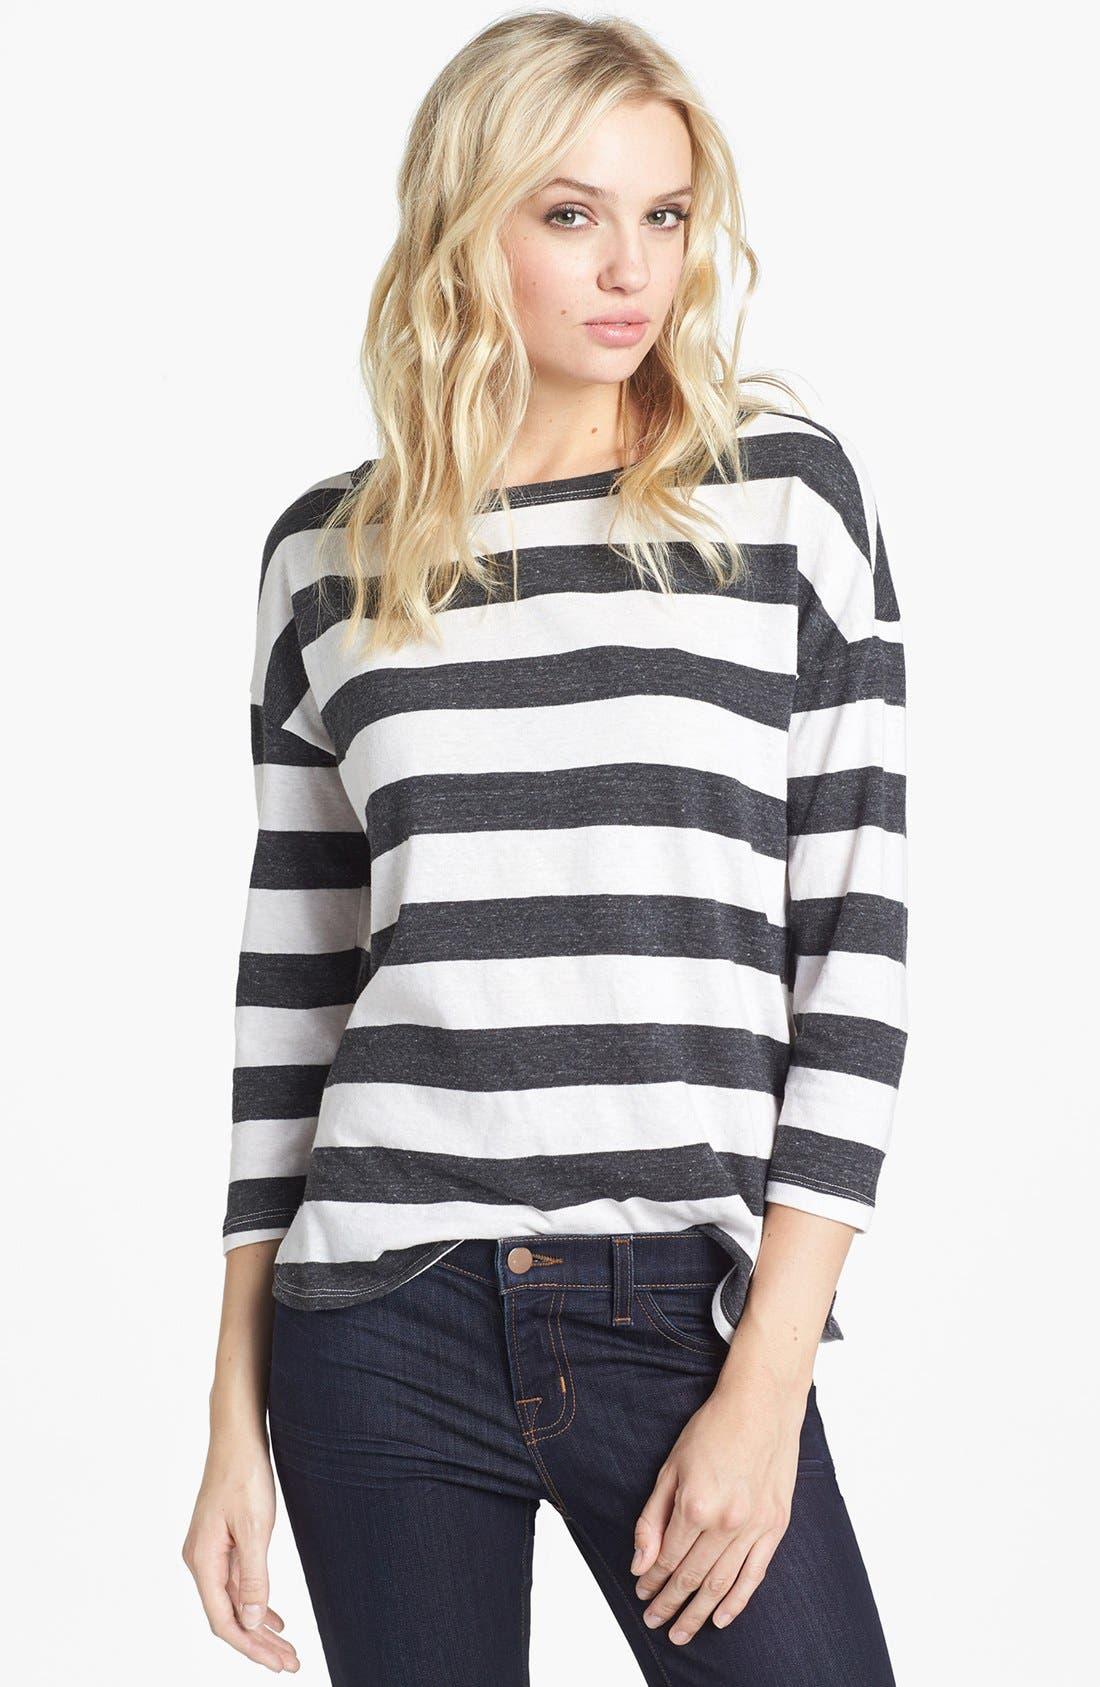 Alternate Image 1 Selected - Soft Joie 'Nash' Stripe Top